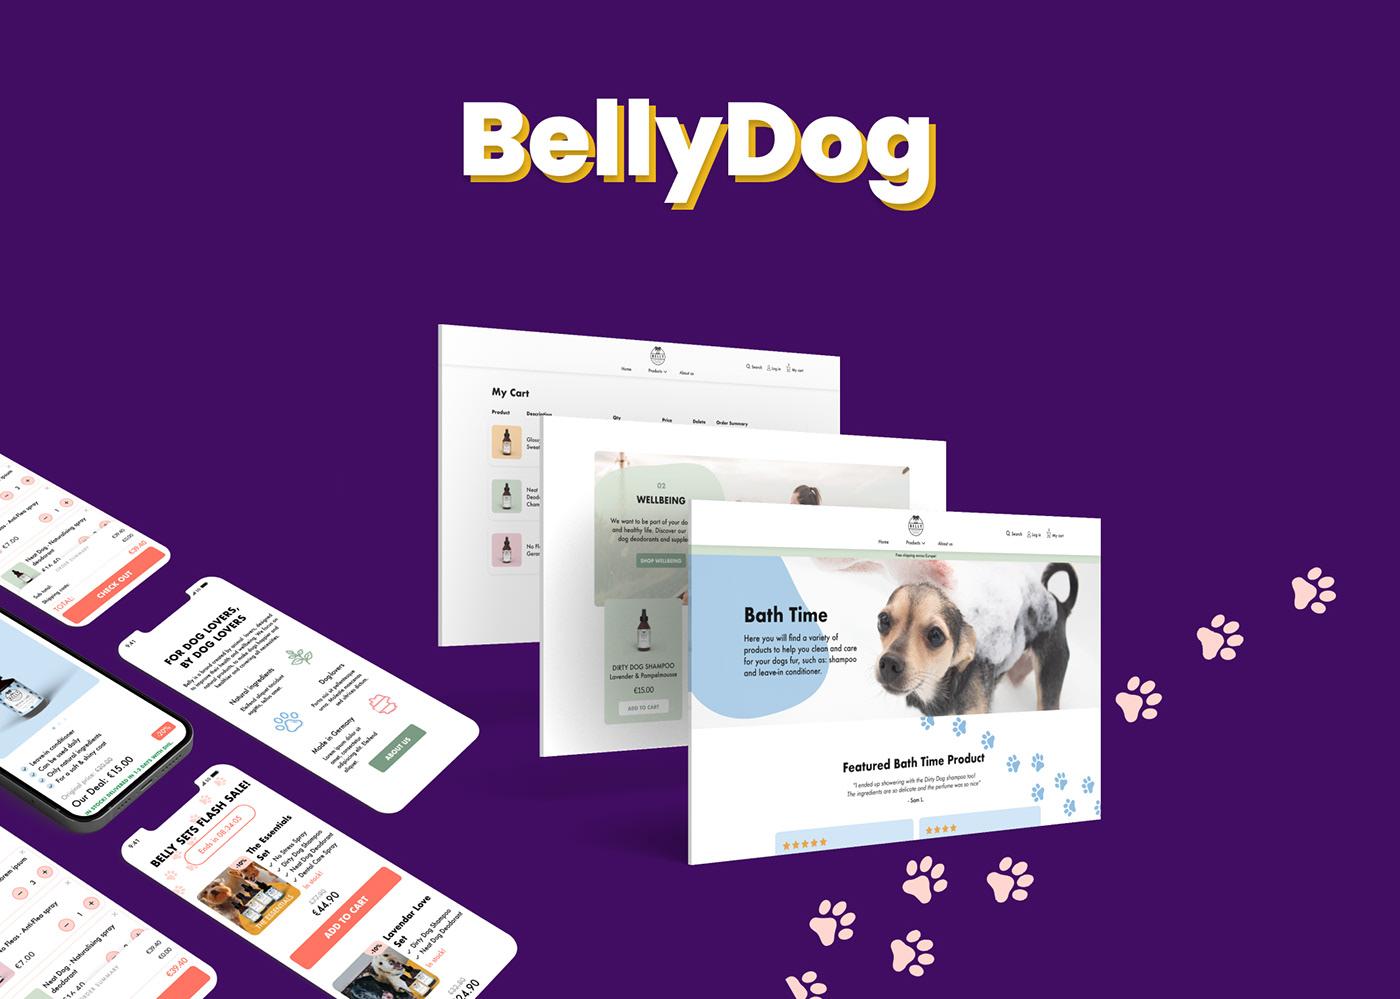 bellydog mobile design uiux Webdesign e-commerce Liquid pet cosmetics SEO&SEA Shopify